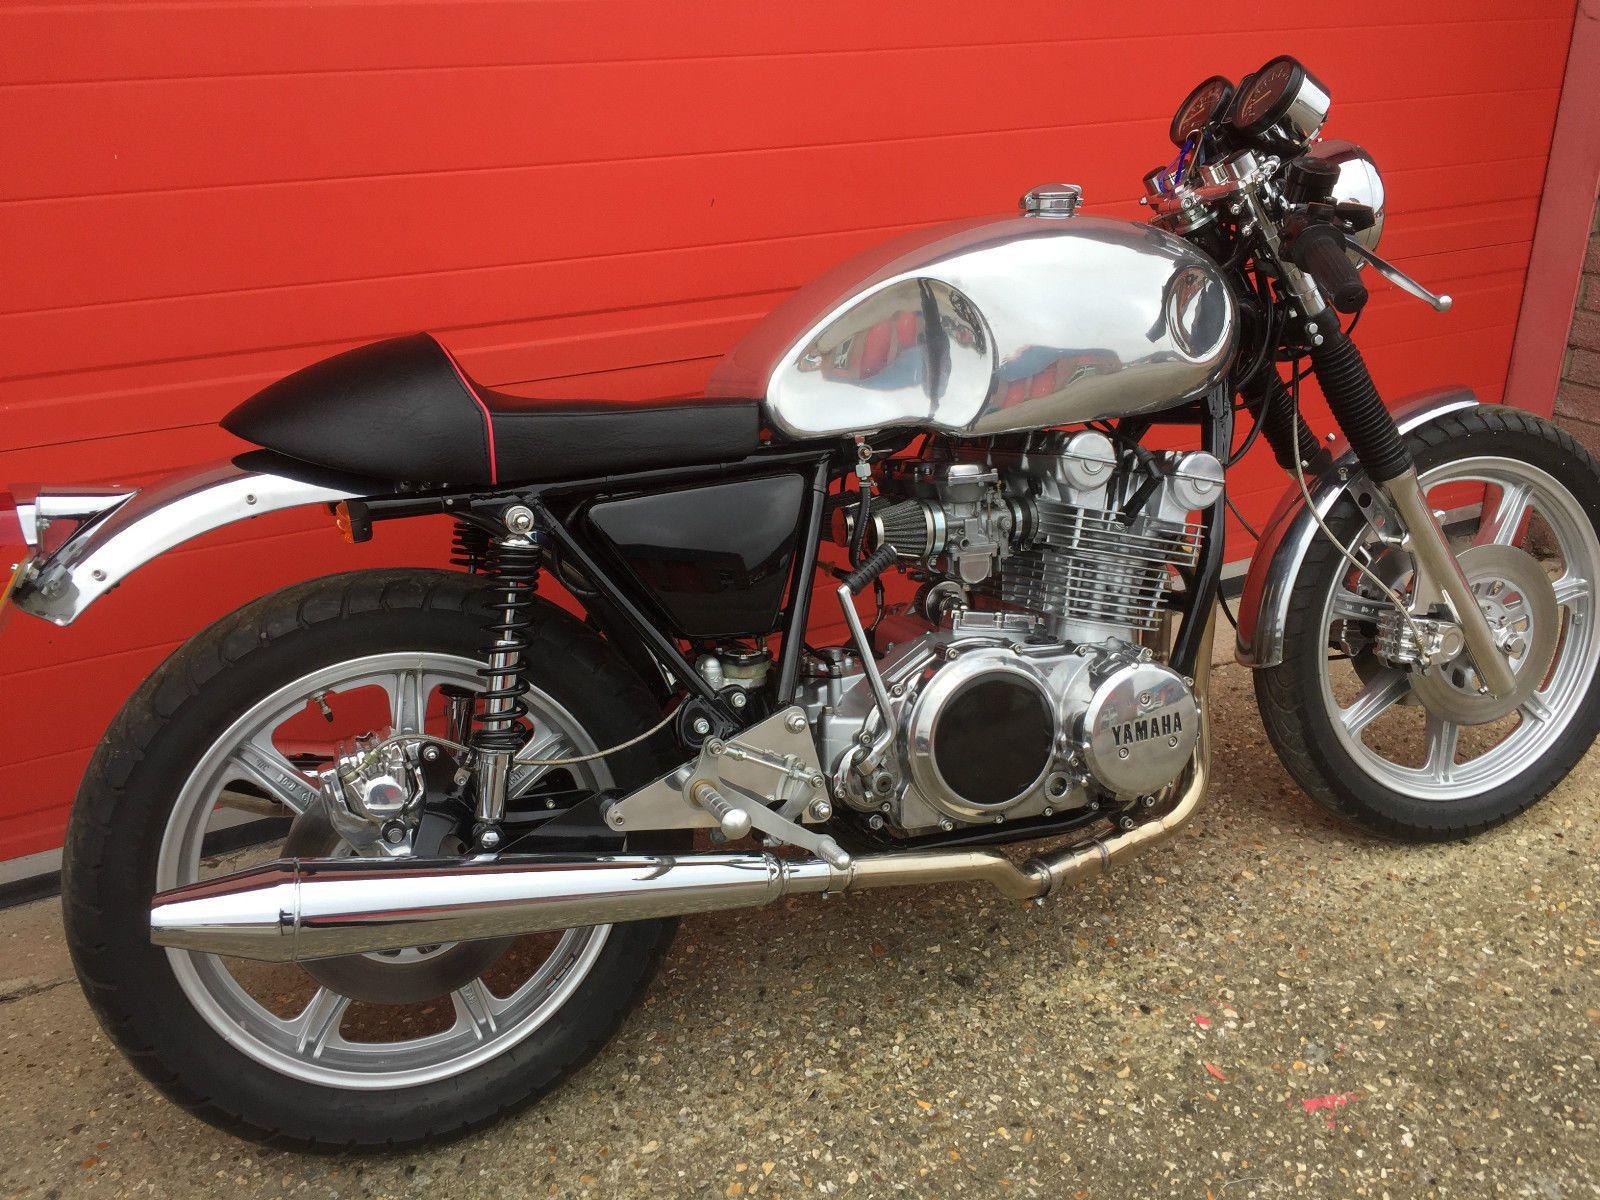 1978 Yamaha Xs750 Cafe Racer Triton Style Sorry Now Sold Deposit Taken Ebay Cafe Racer Yamaha Racer [ 1200 x 1600 Pixel ]